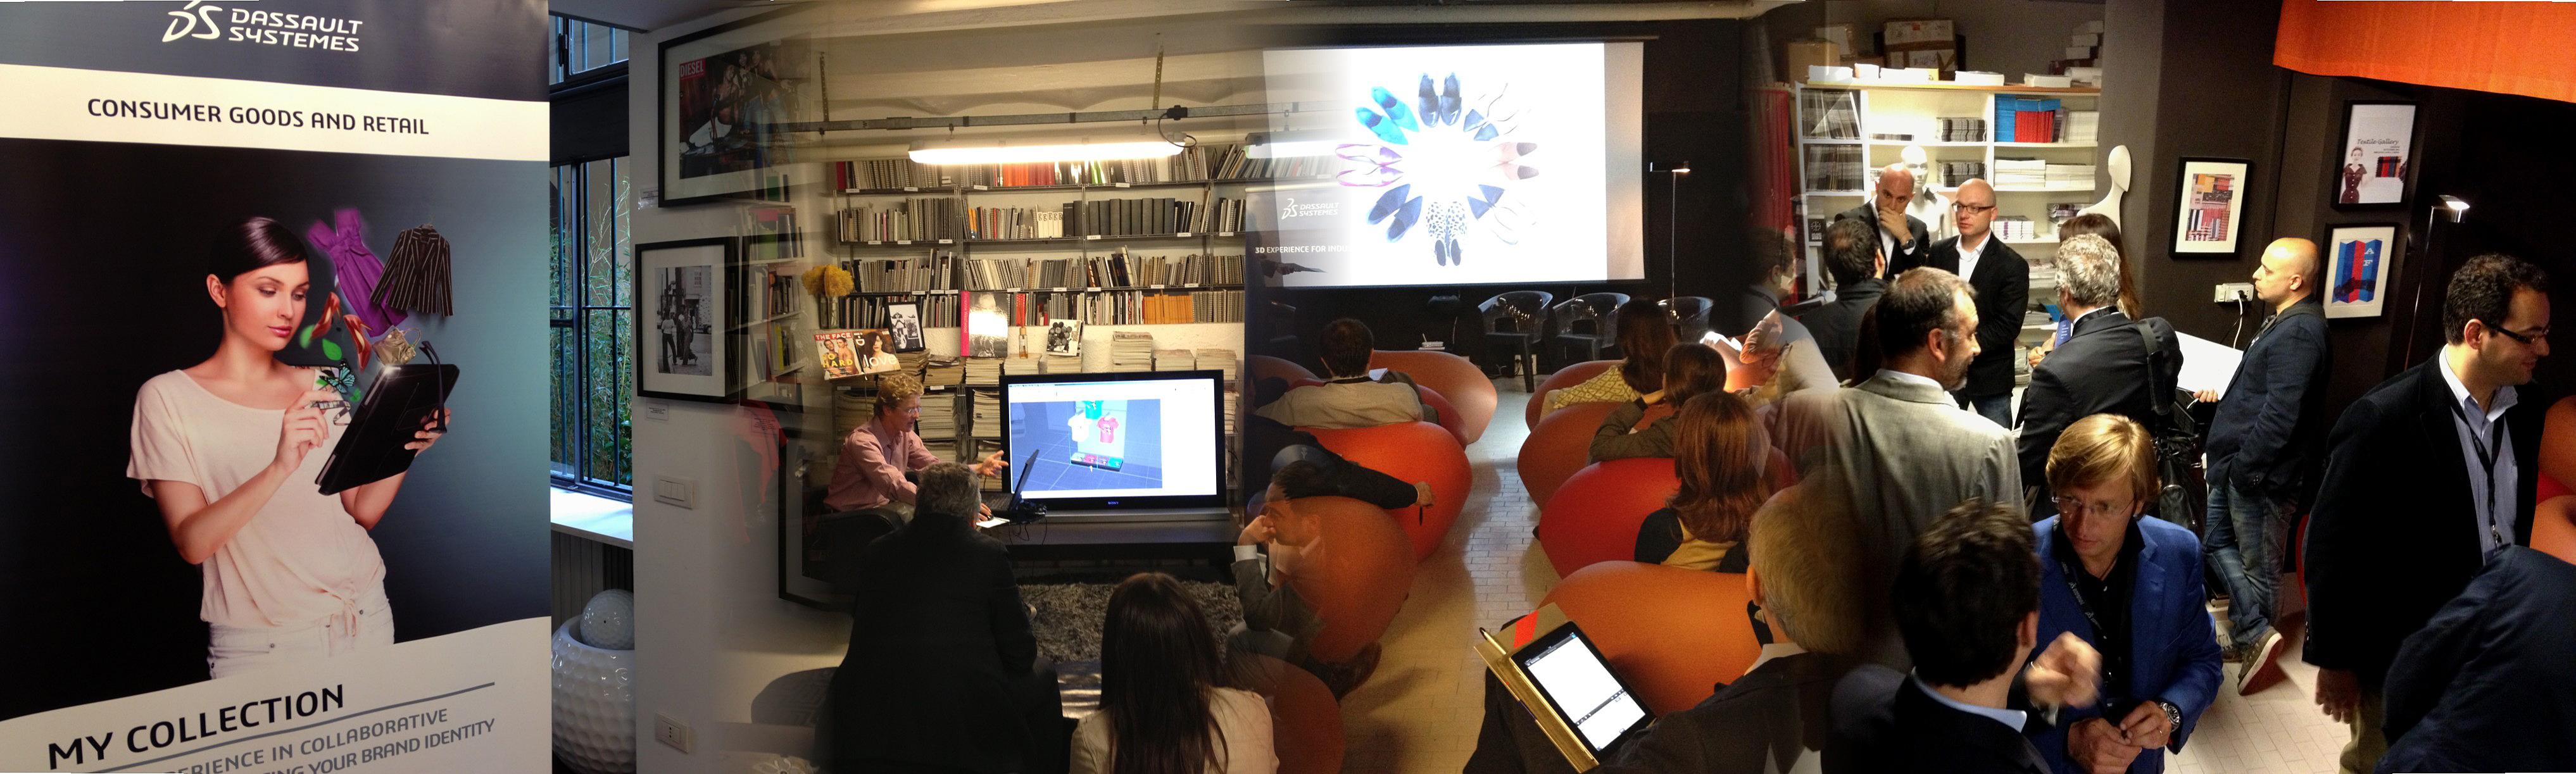 Technology Defile at Biblioteca della Moda in Milan